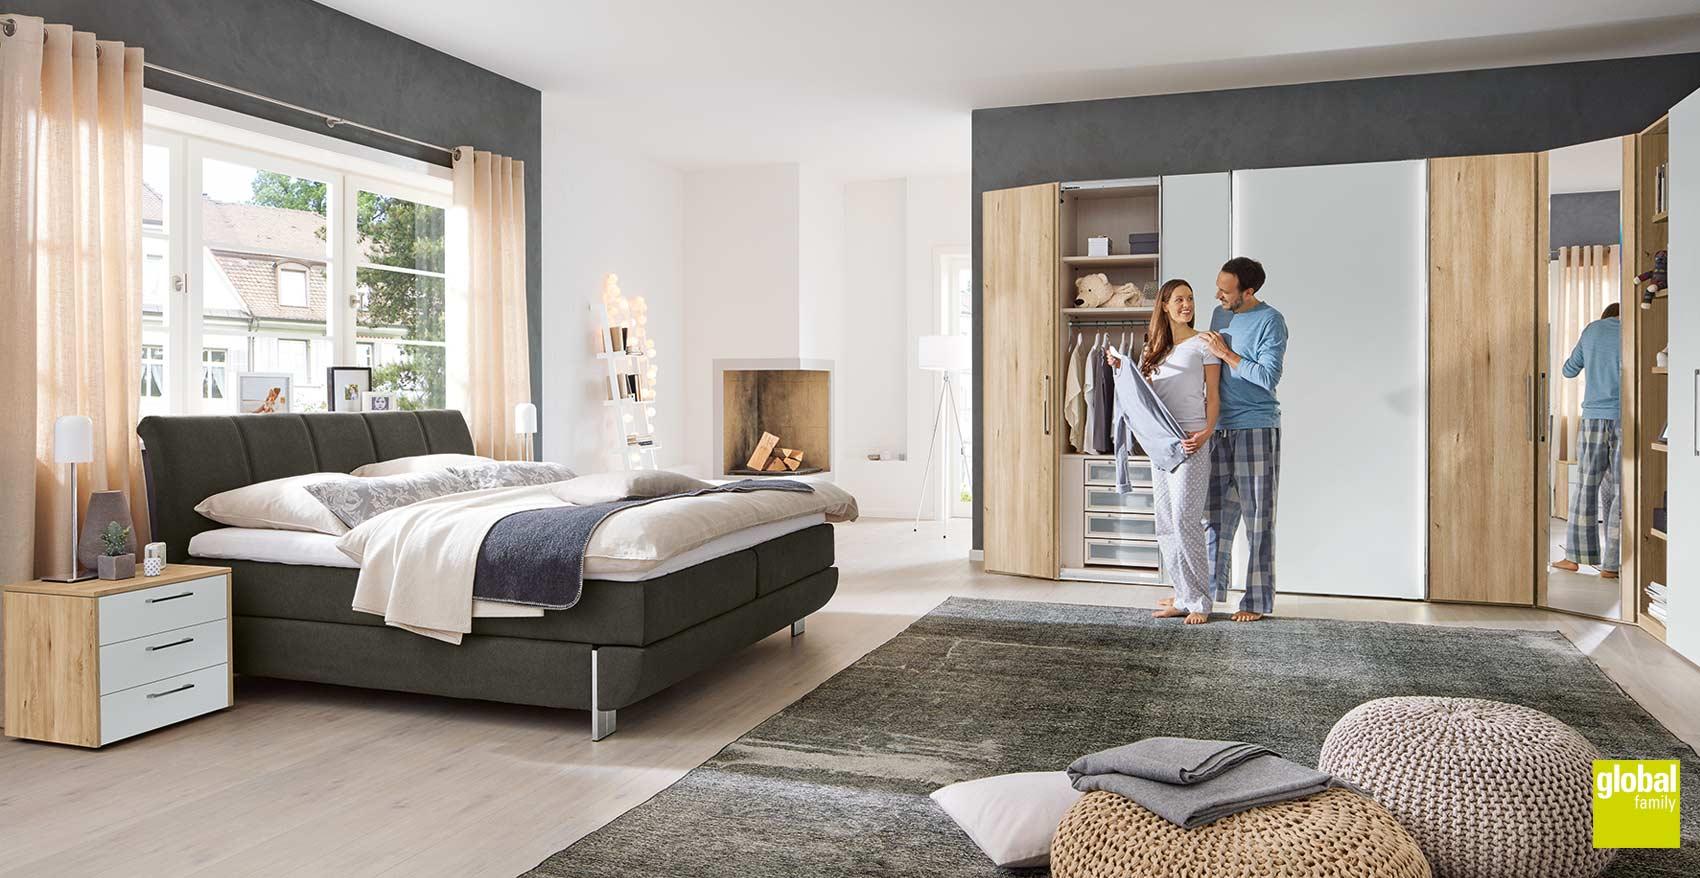 Möbel Augsburg global 2100 global wohnen in rehling nahe augsburg möbel raschke